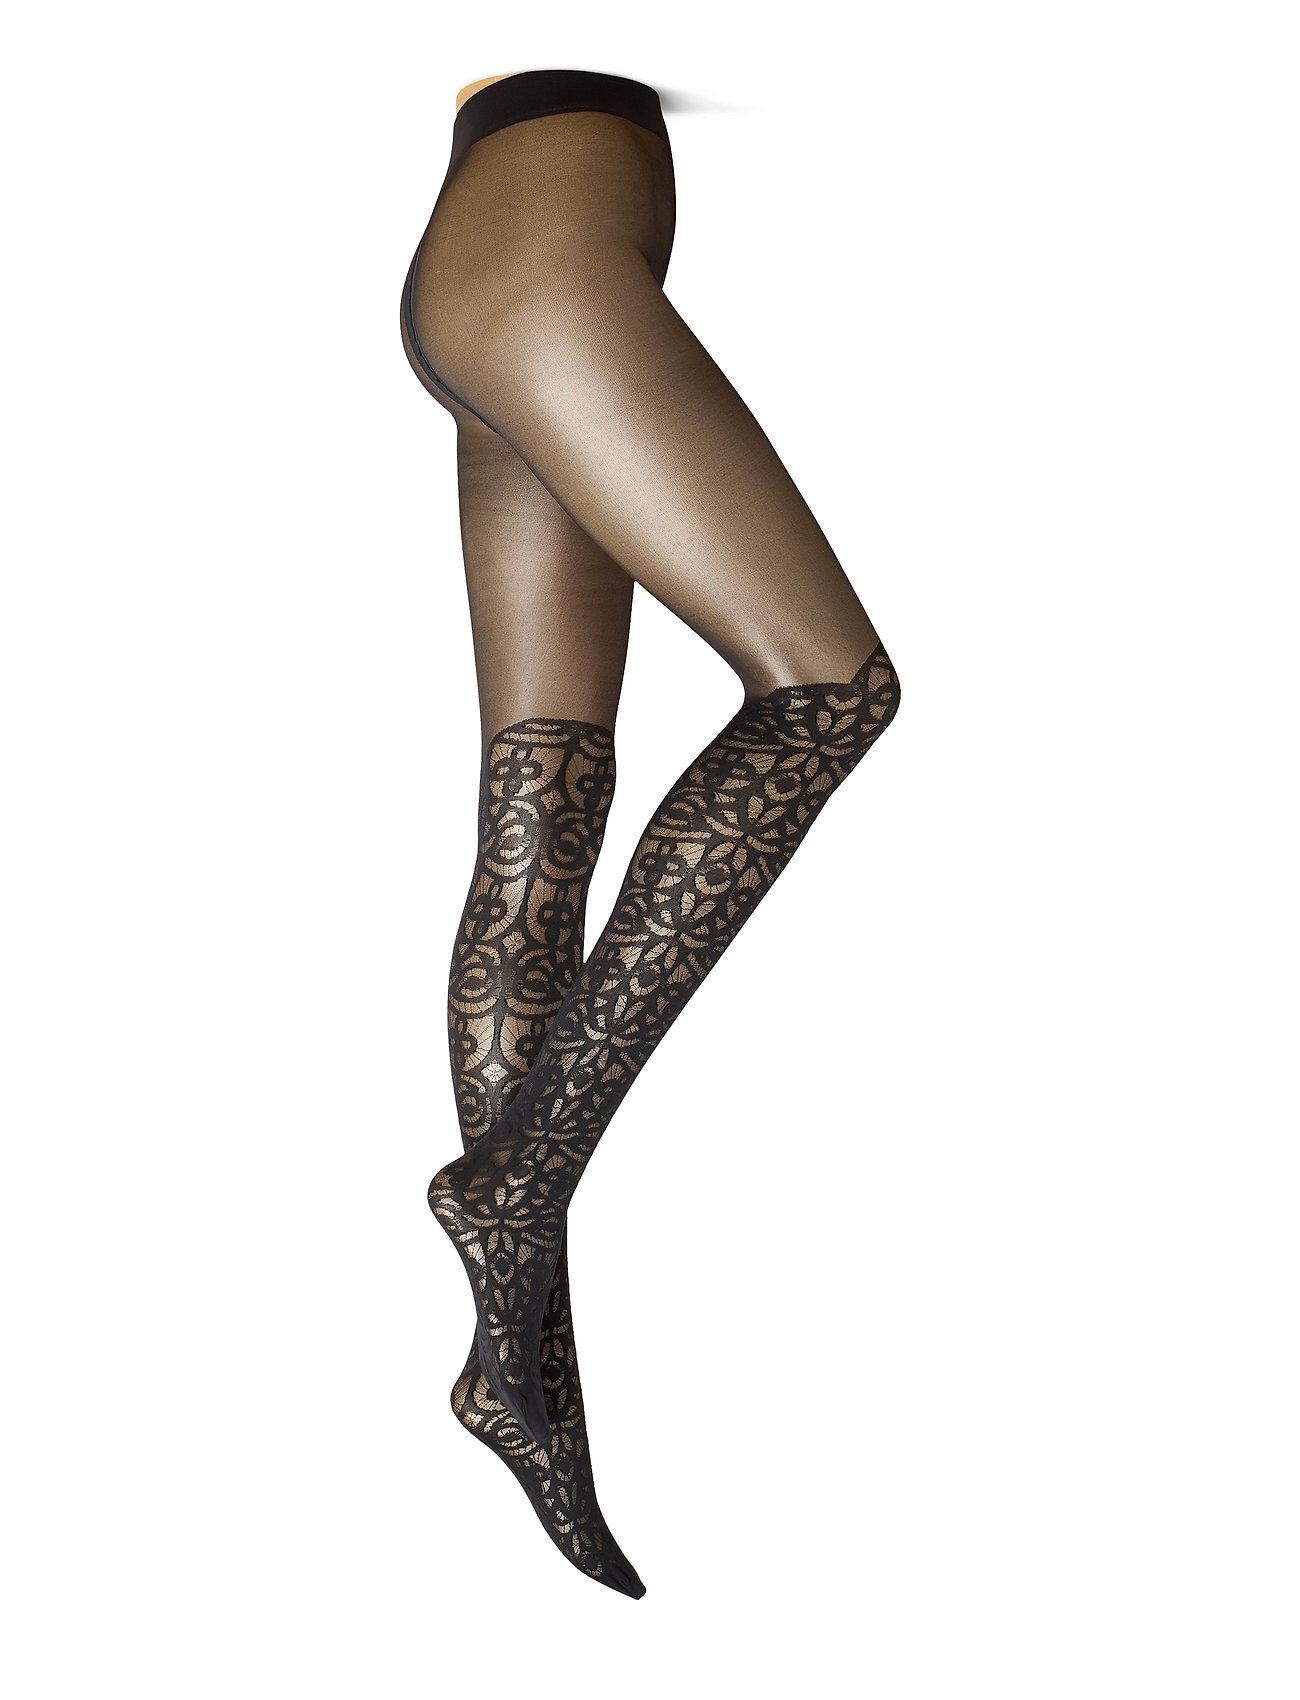 Swedish Stockings Linnea Lace Tights Running/training Tights Musta Swedish Stockings